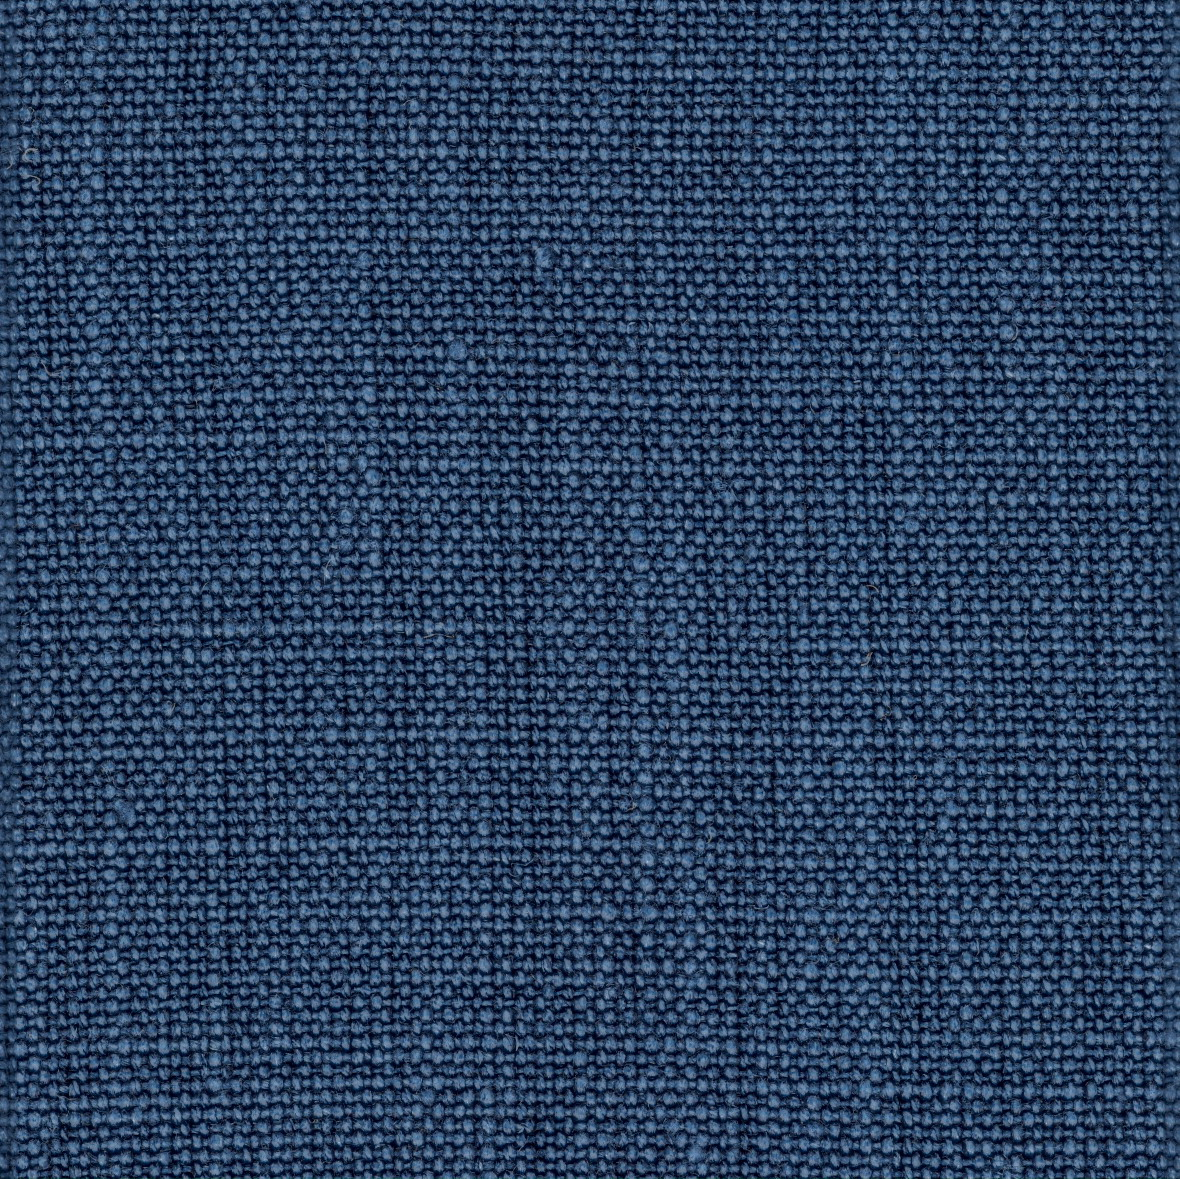 PISA Blue Jeans